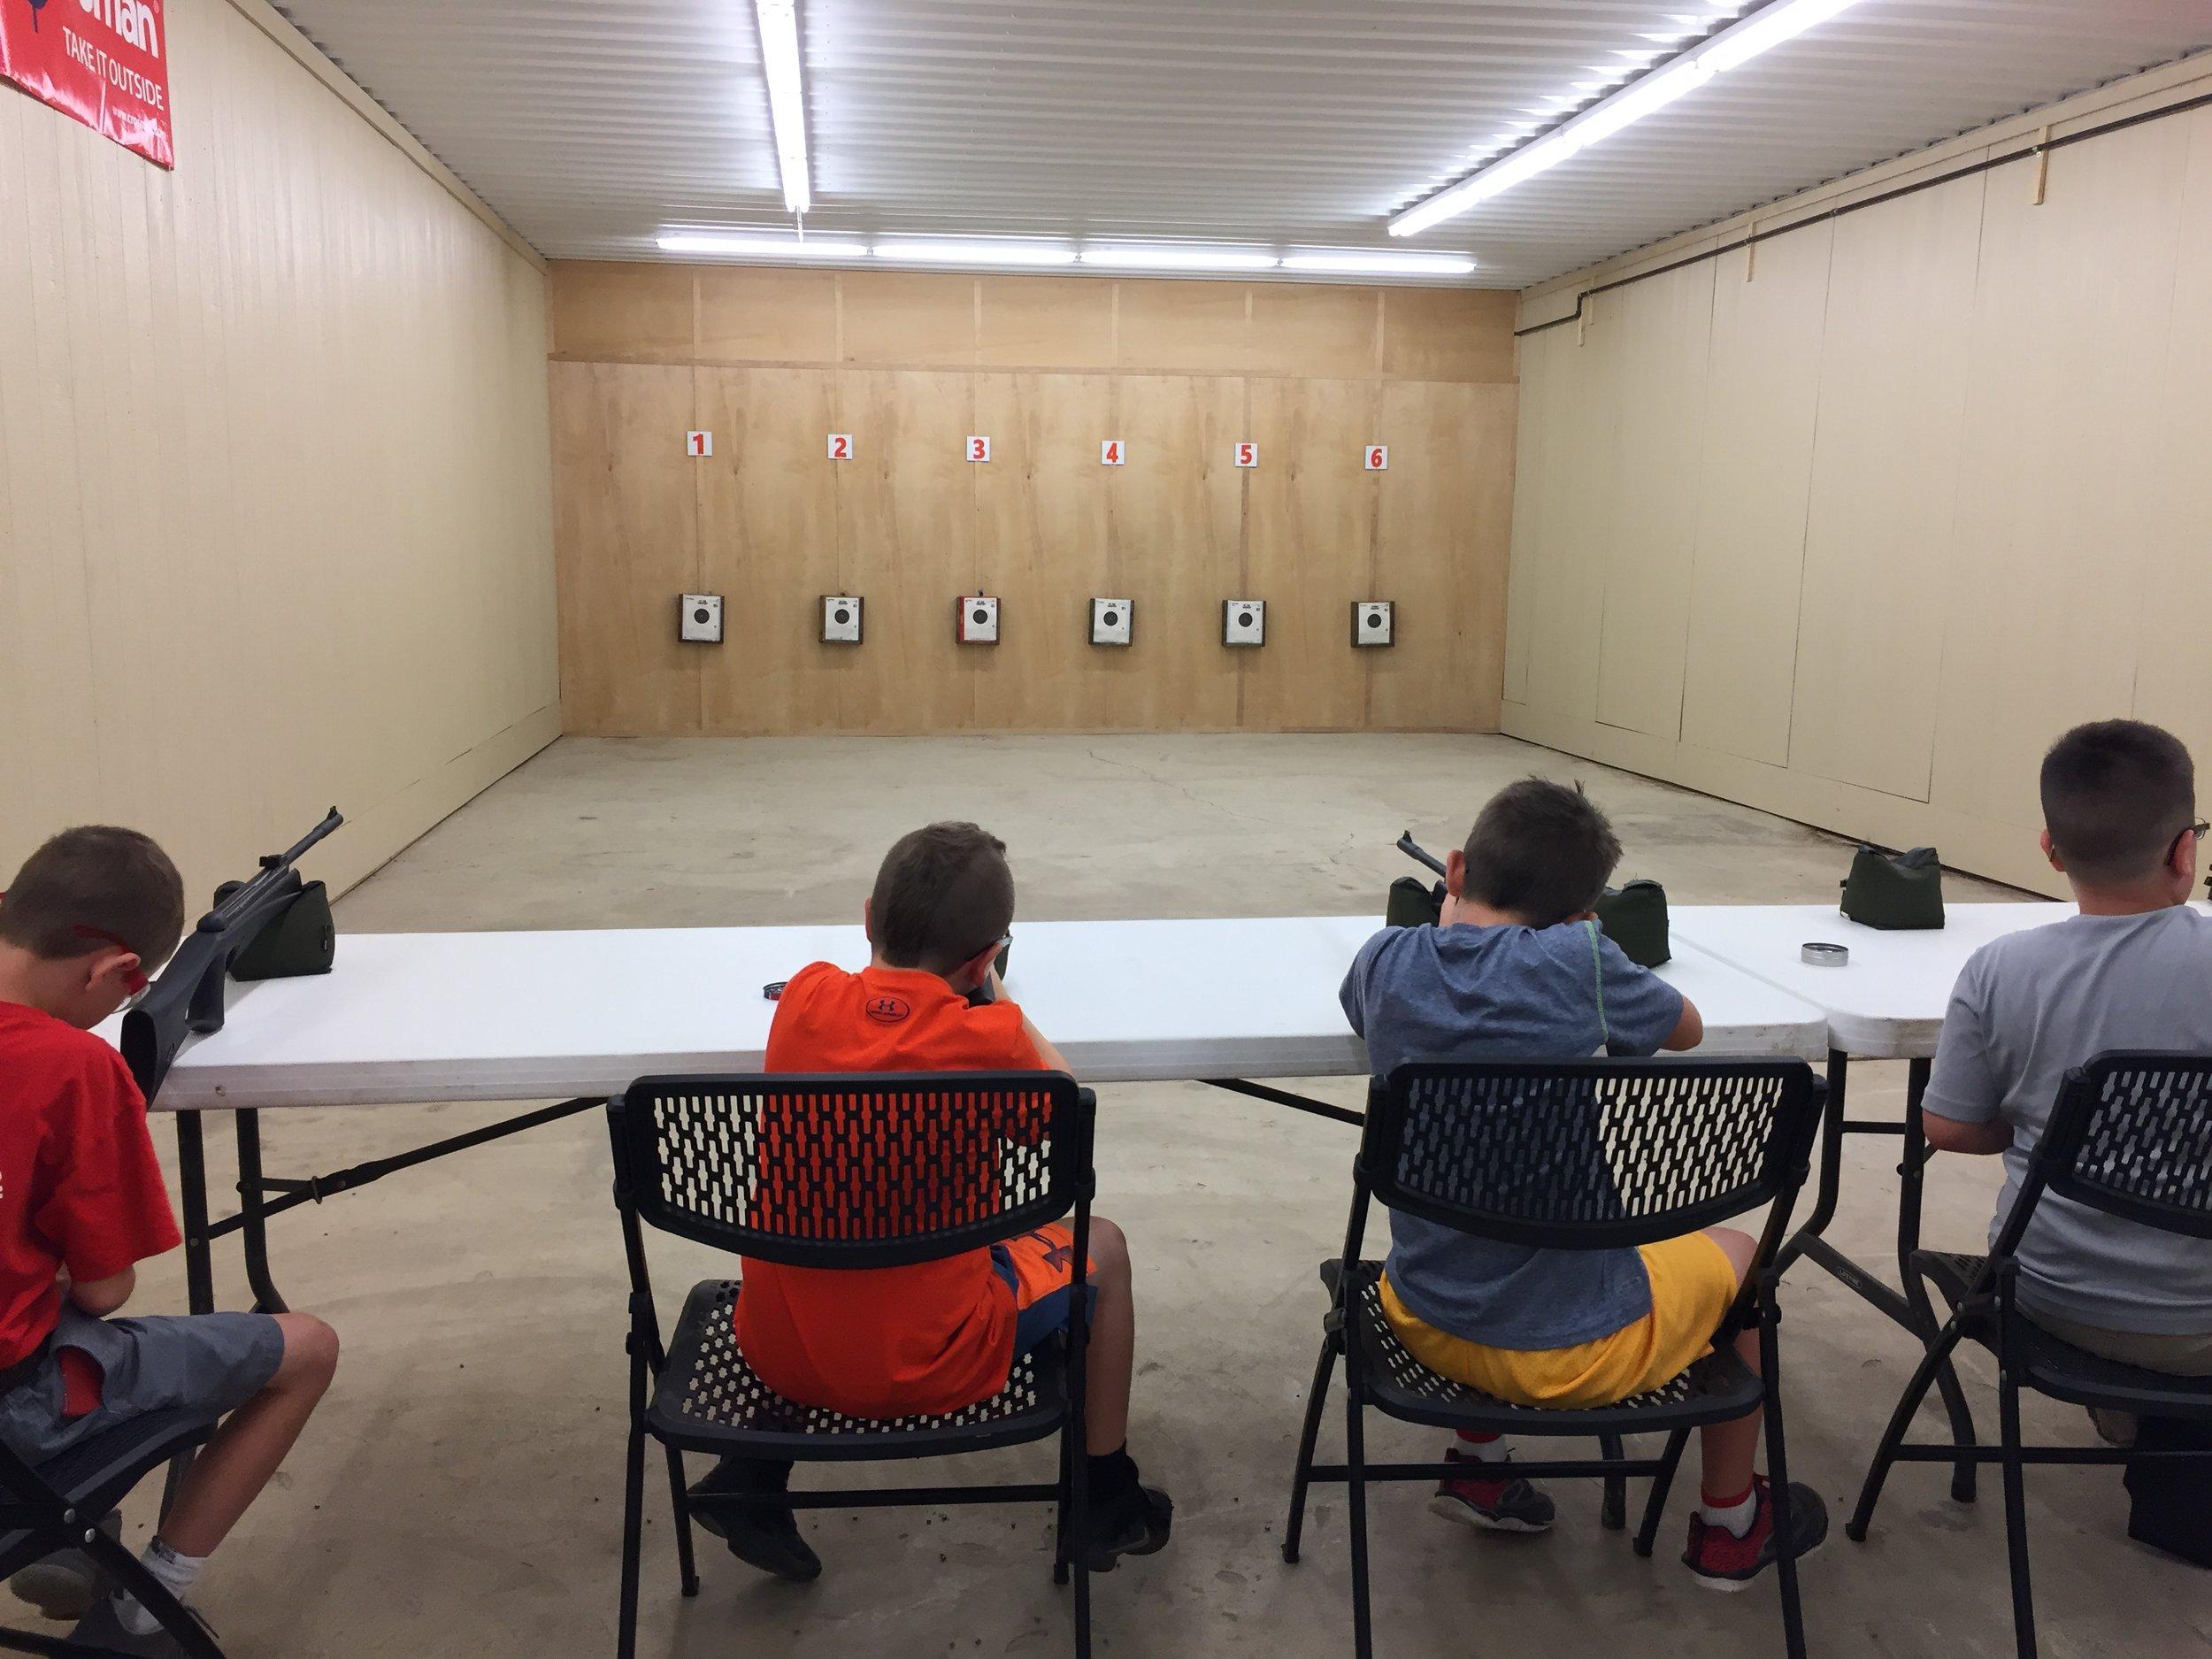 Indoor air rifle range